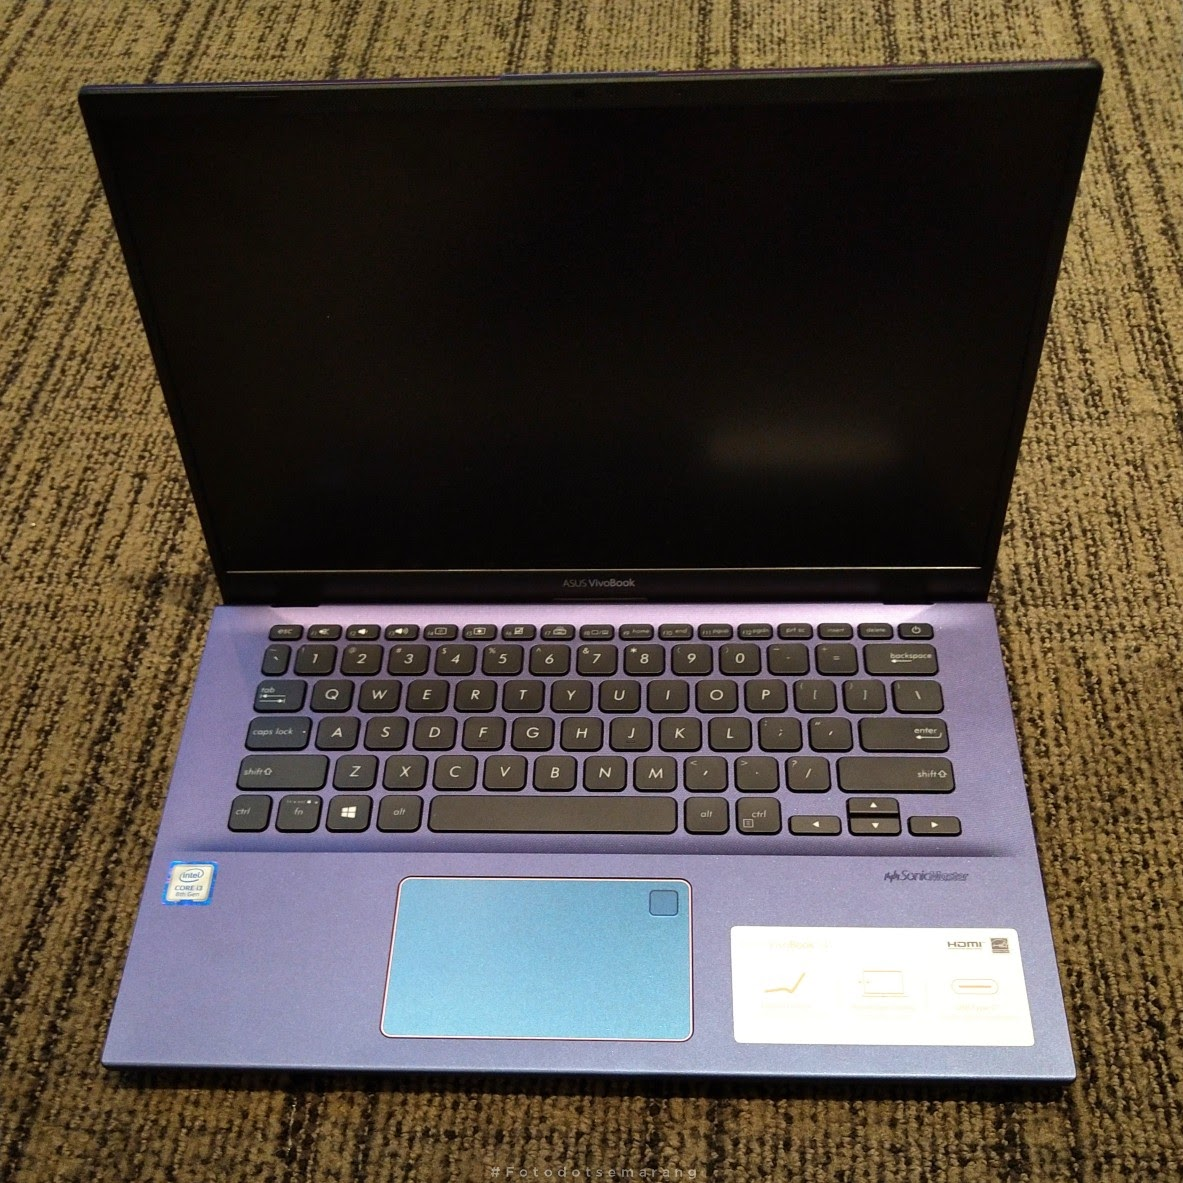 Review Asus Vivobook Ultra A412 - Spesifikasi Asus Vivobook Ultra A412